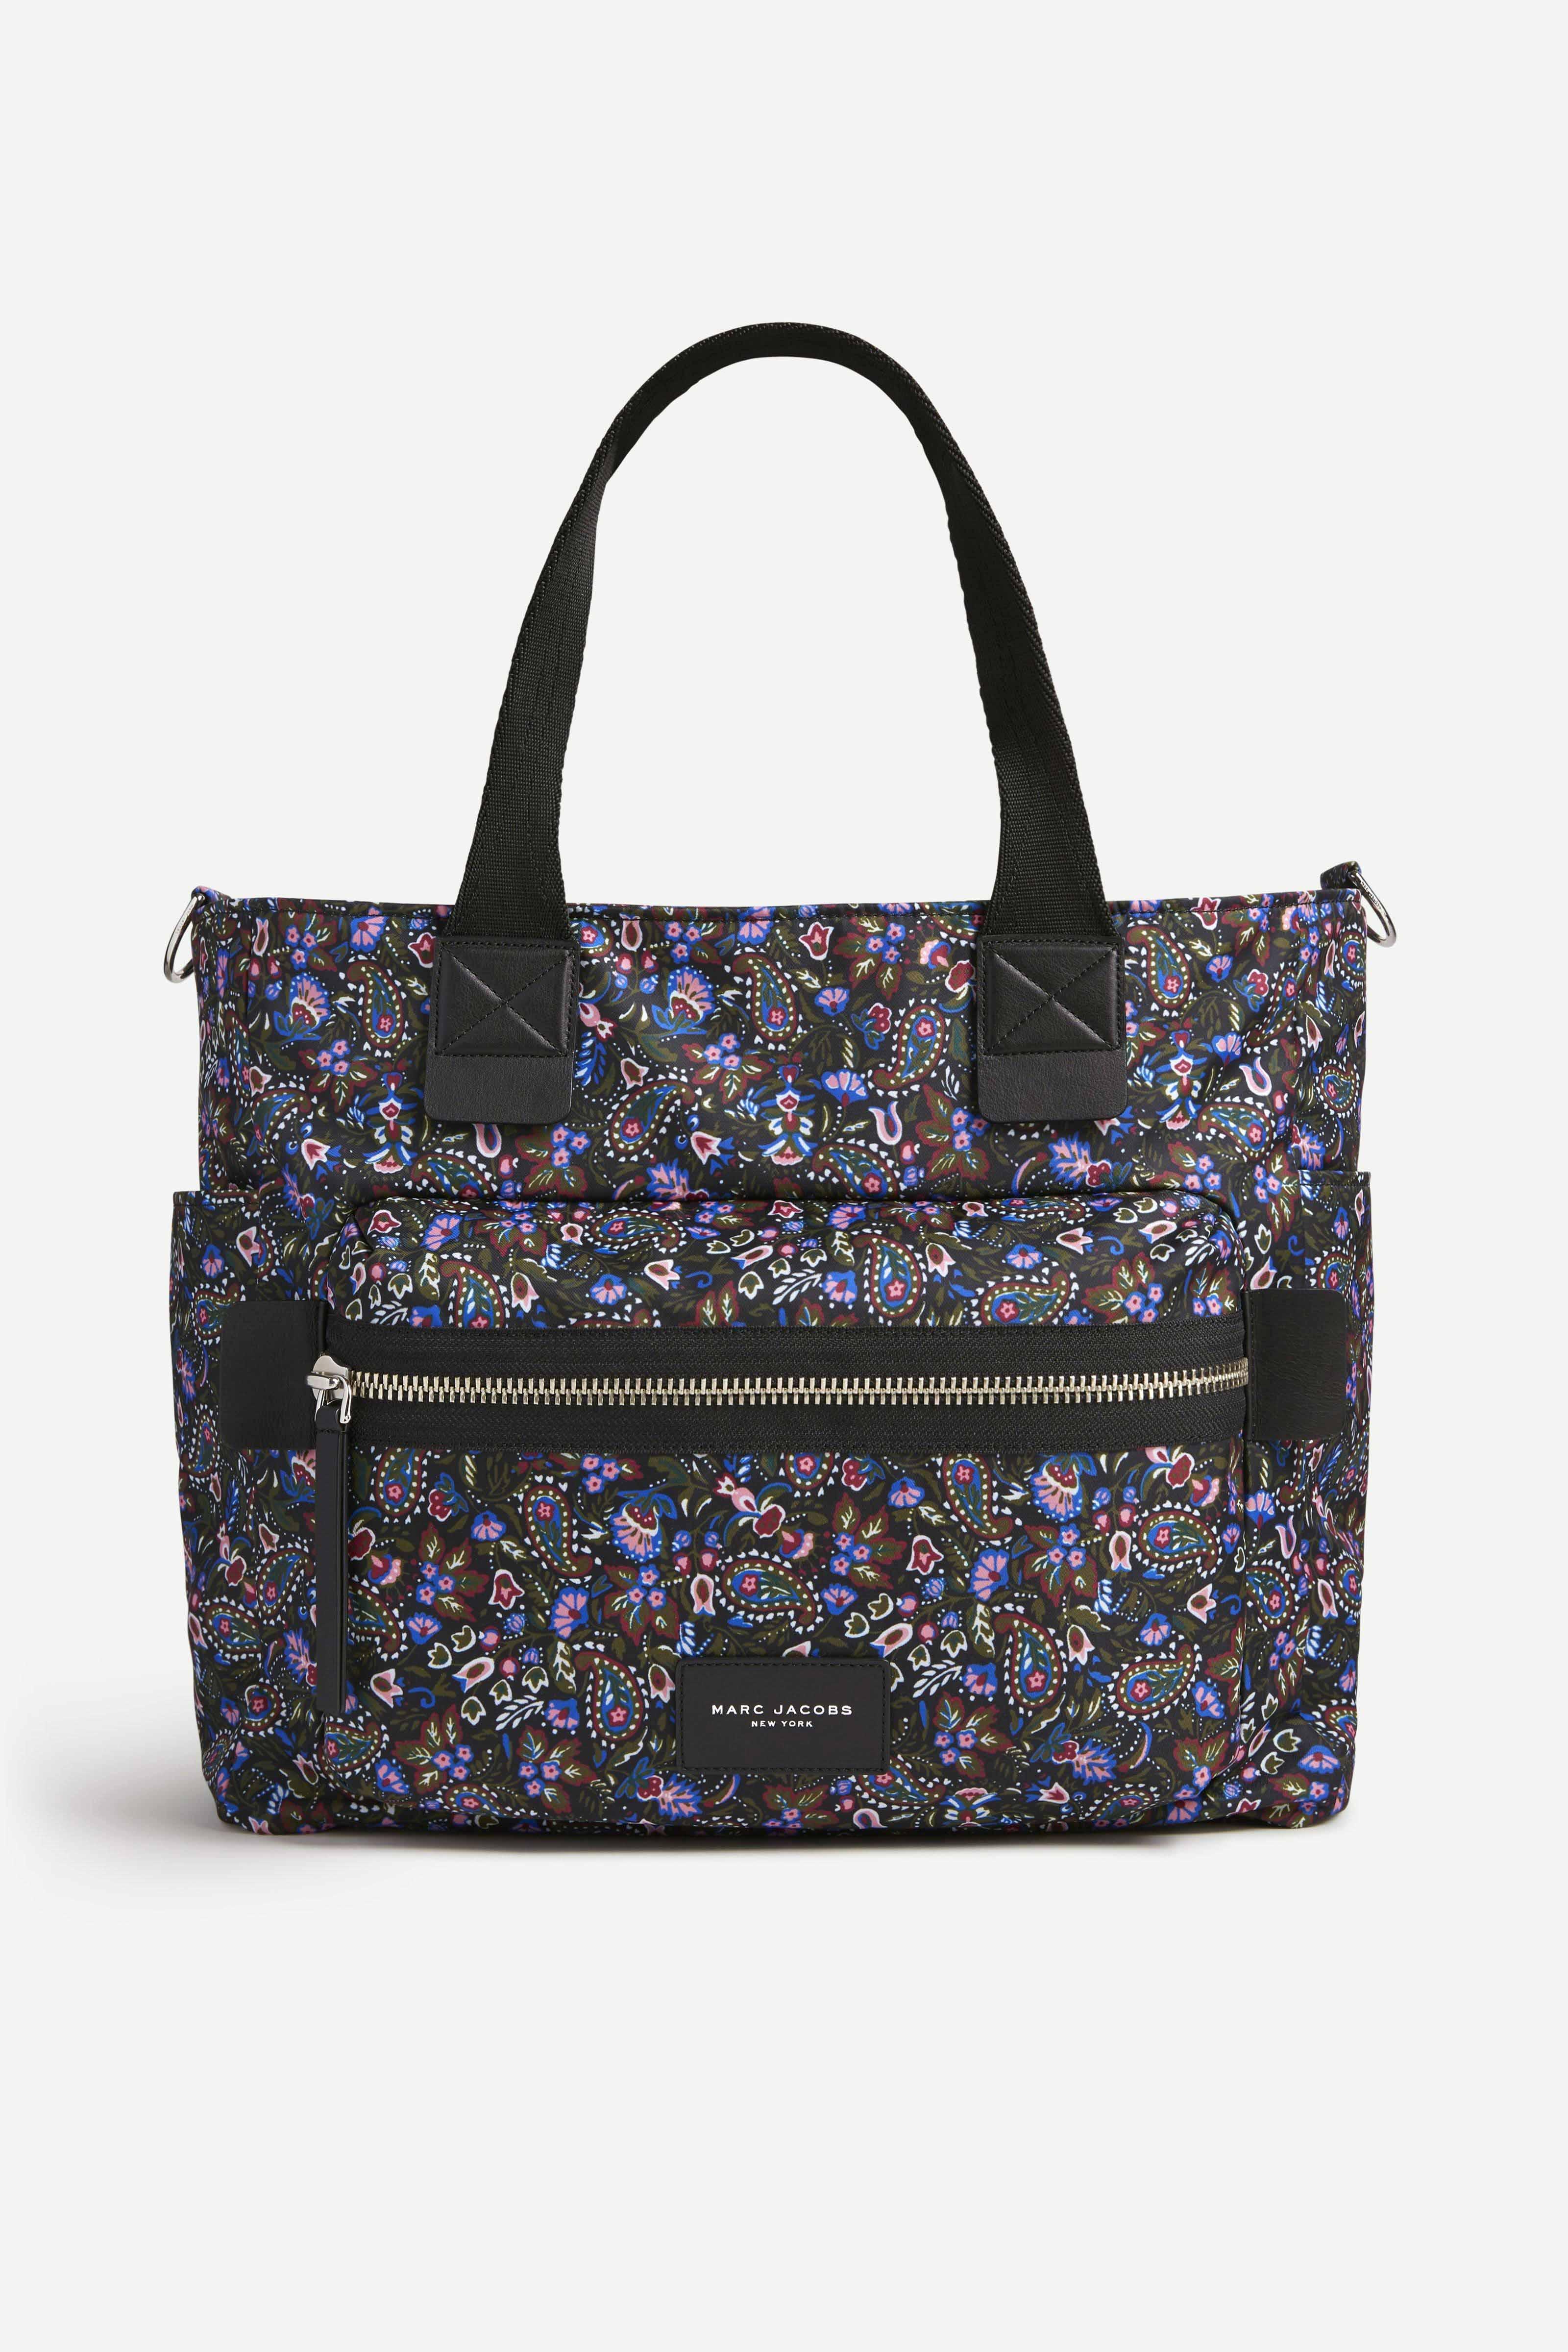 Marc Jacobs 16 - Printed Baby Bag - Purple Multi